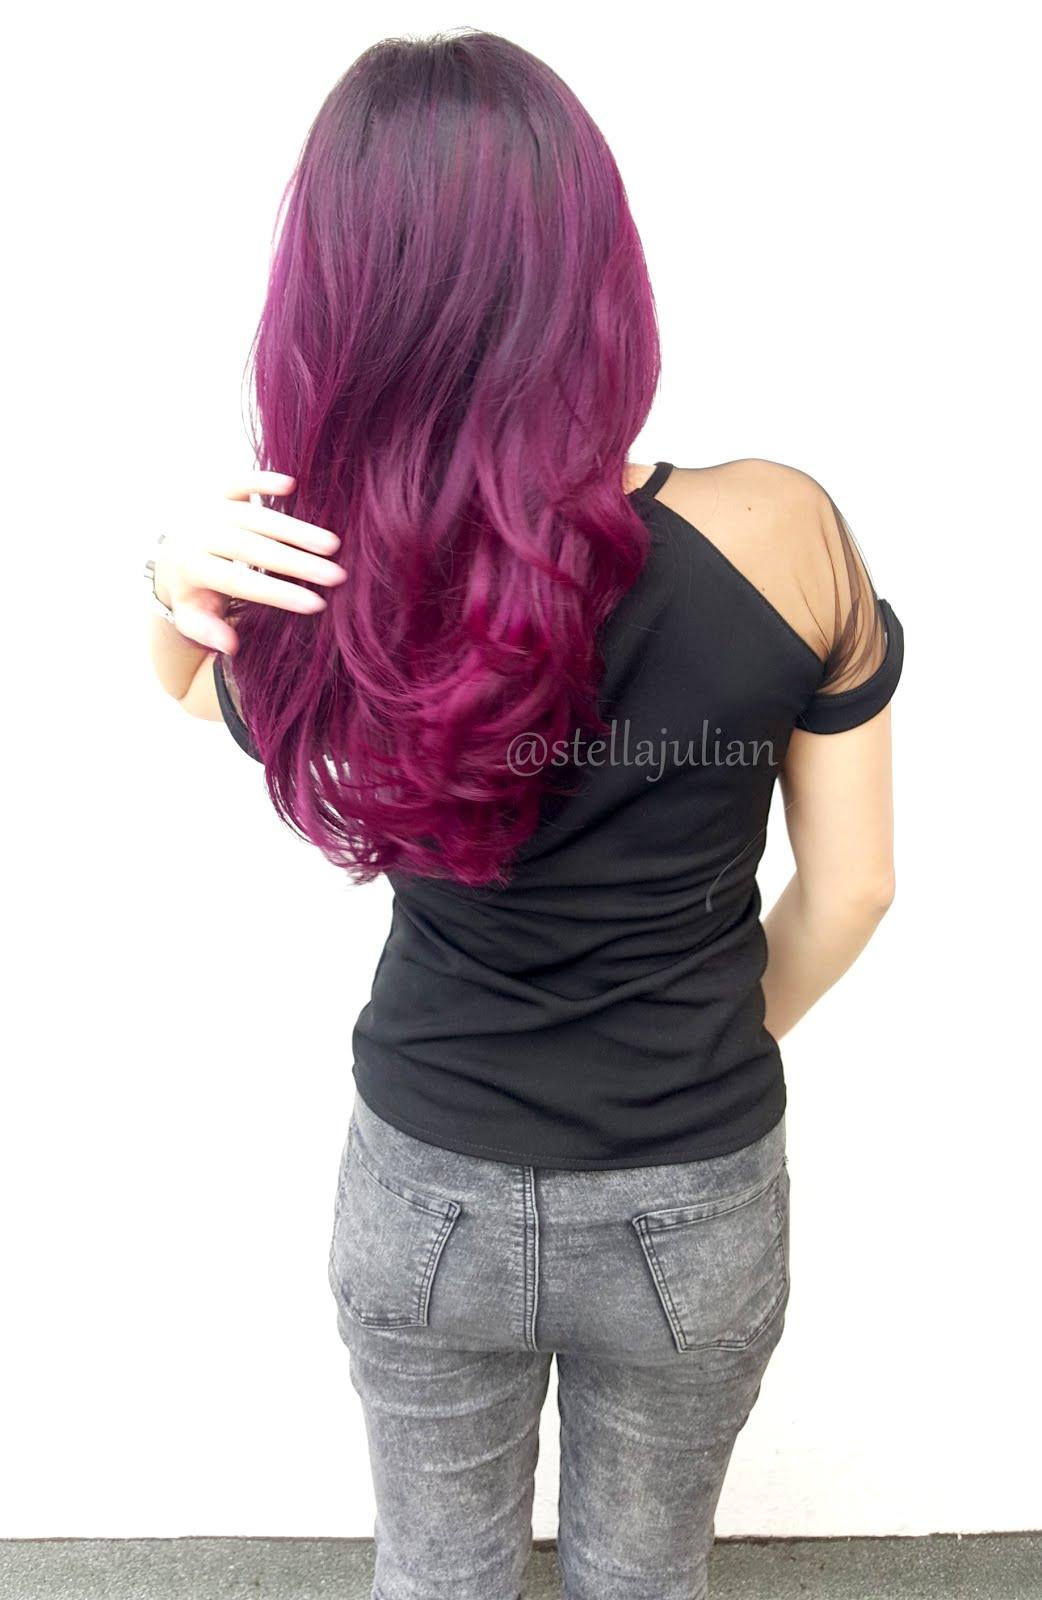 New Purple Hair My Colorful Hair Journey Stella Julian